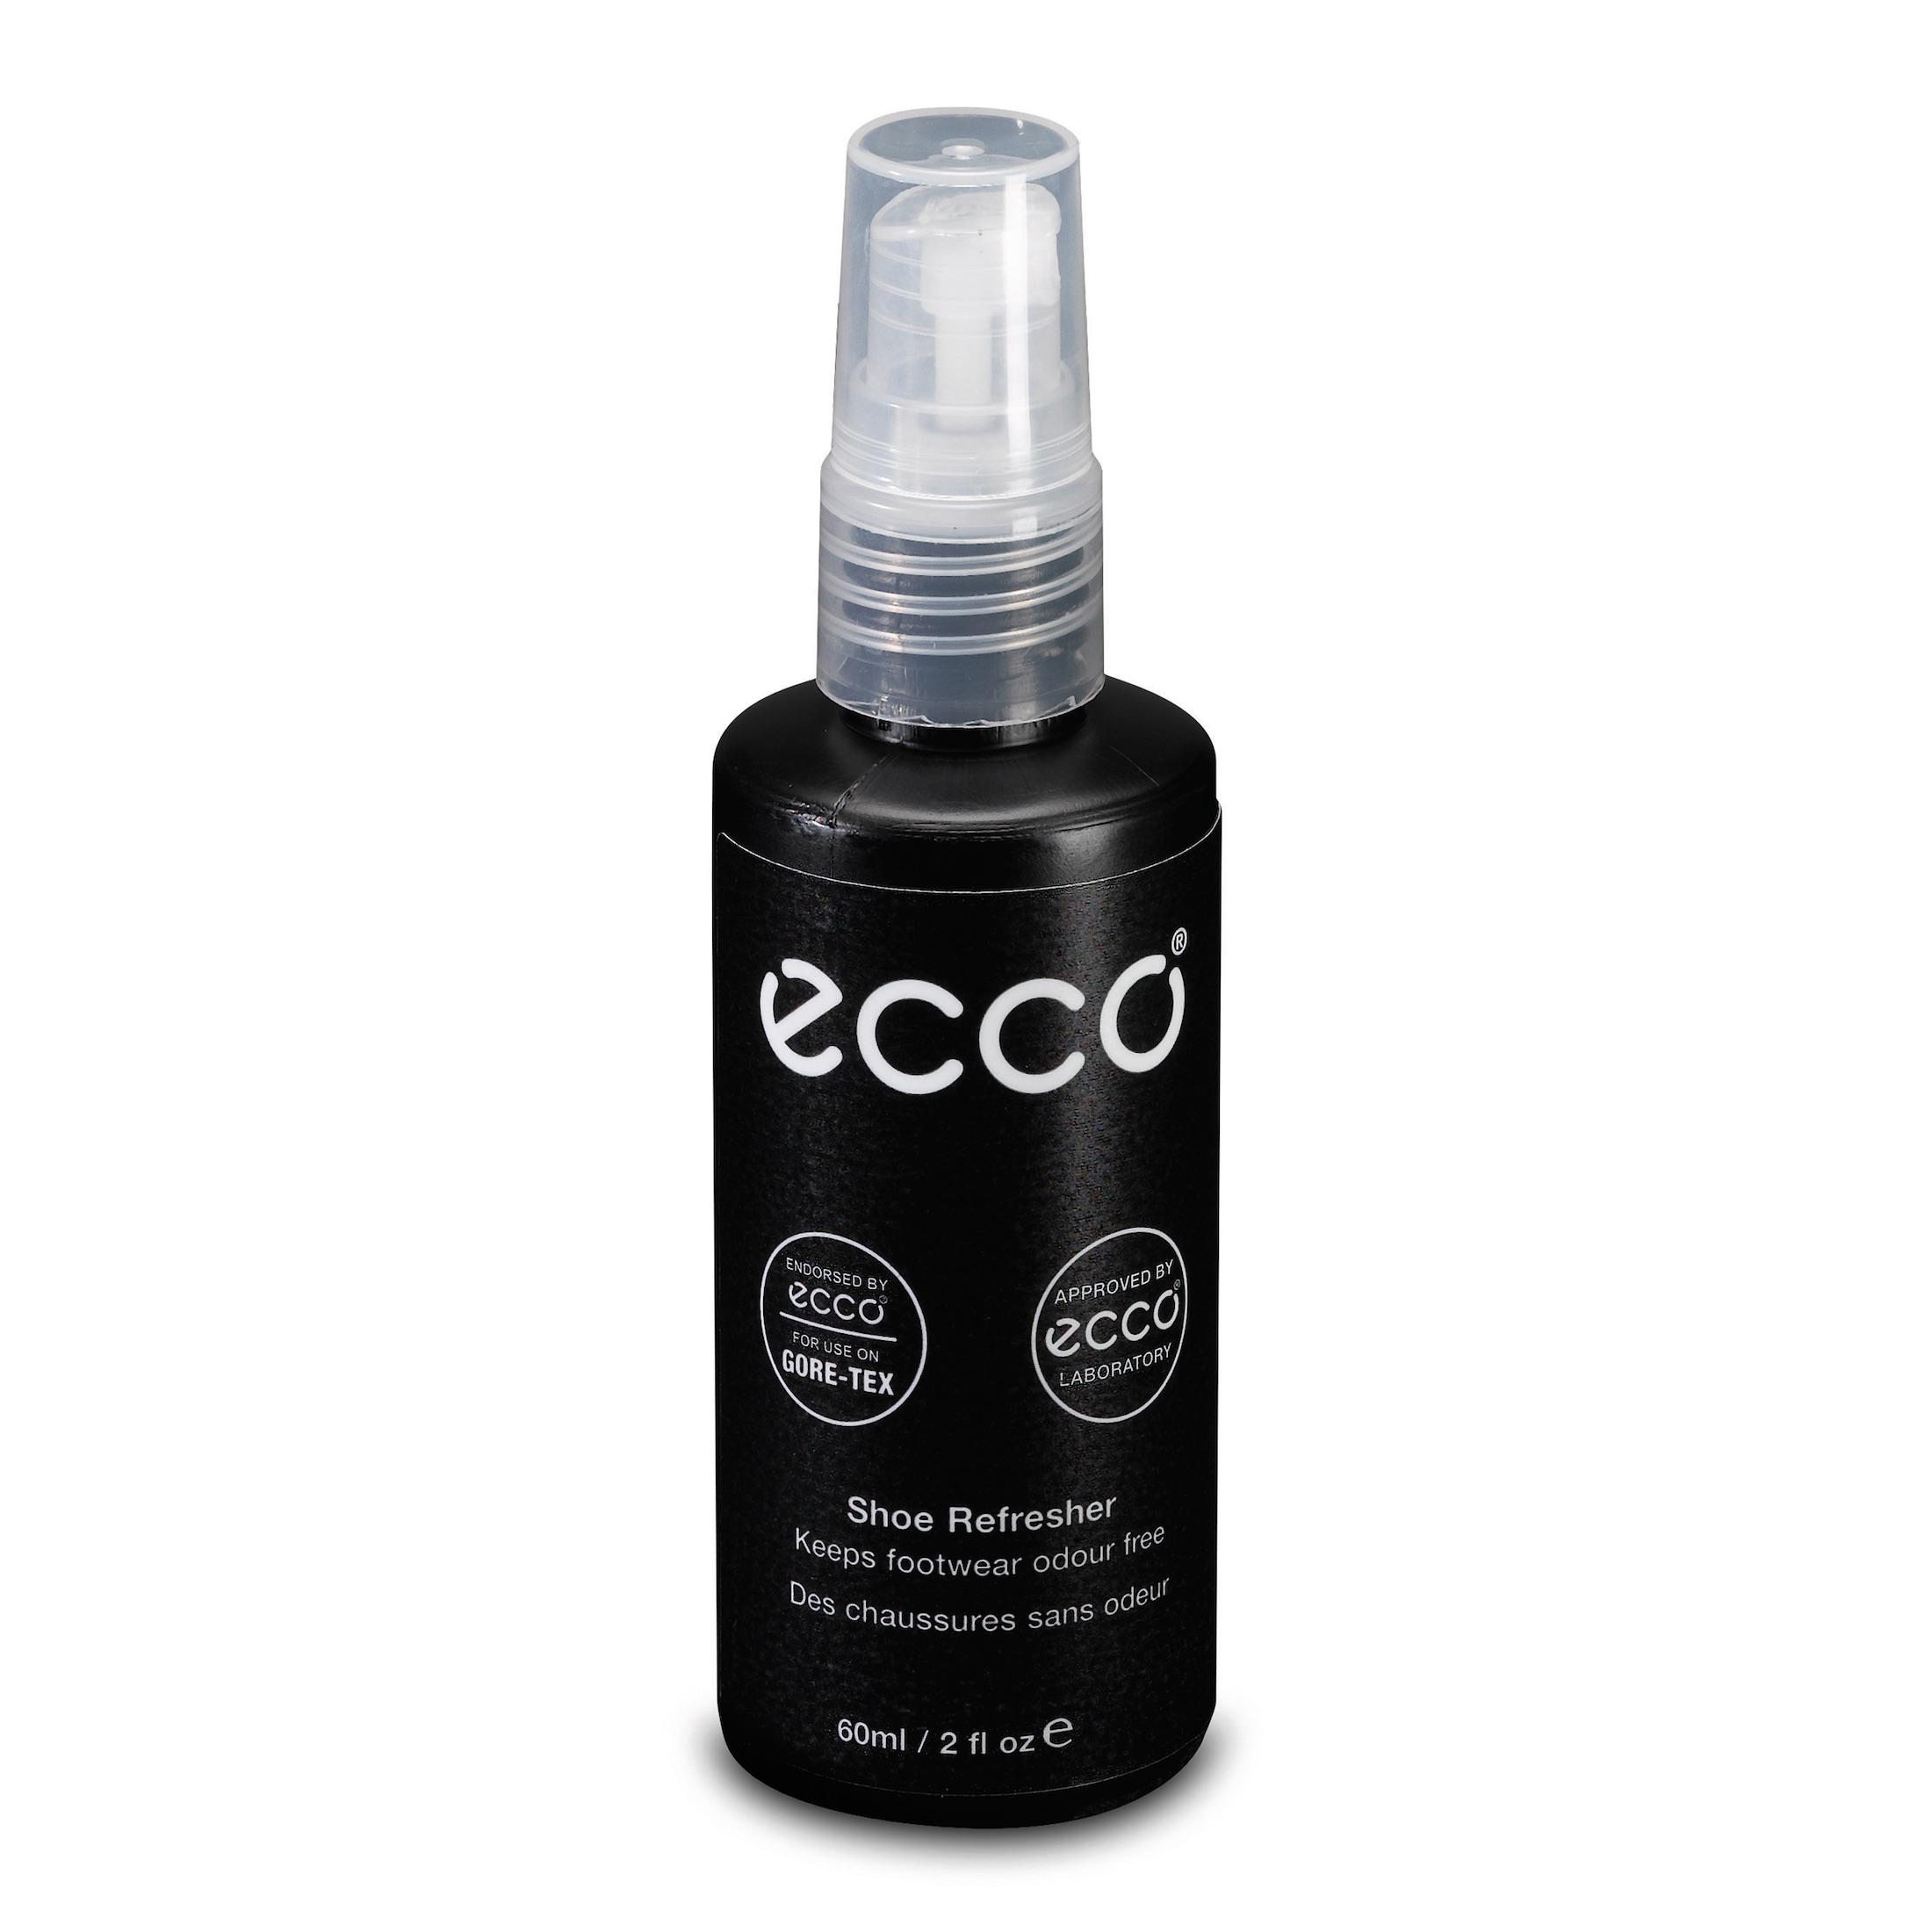 Image of ECCO Shoe Refresher Spray